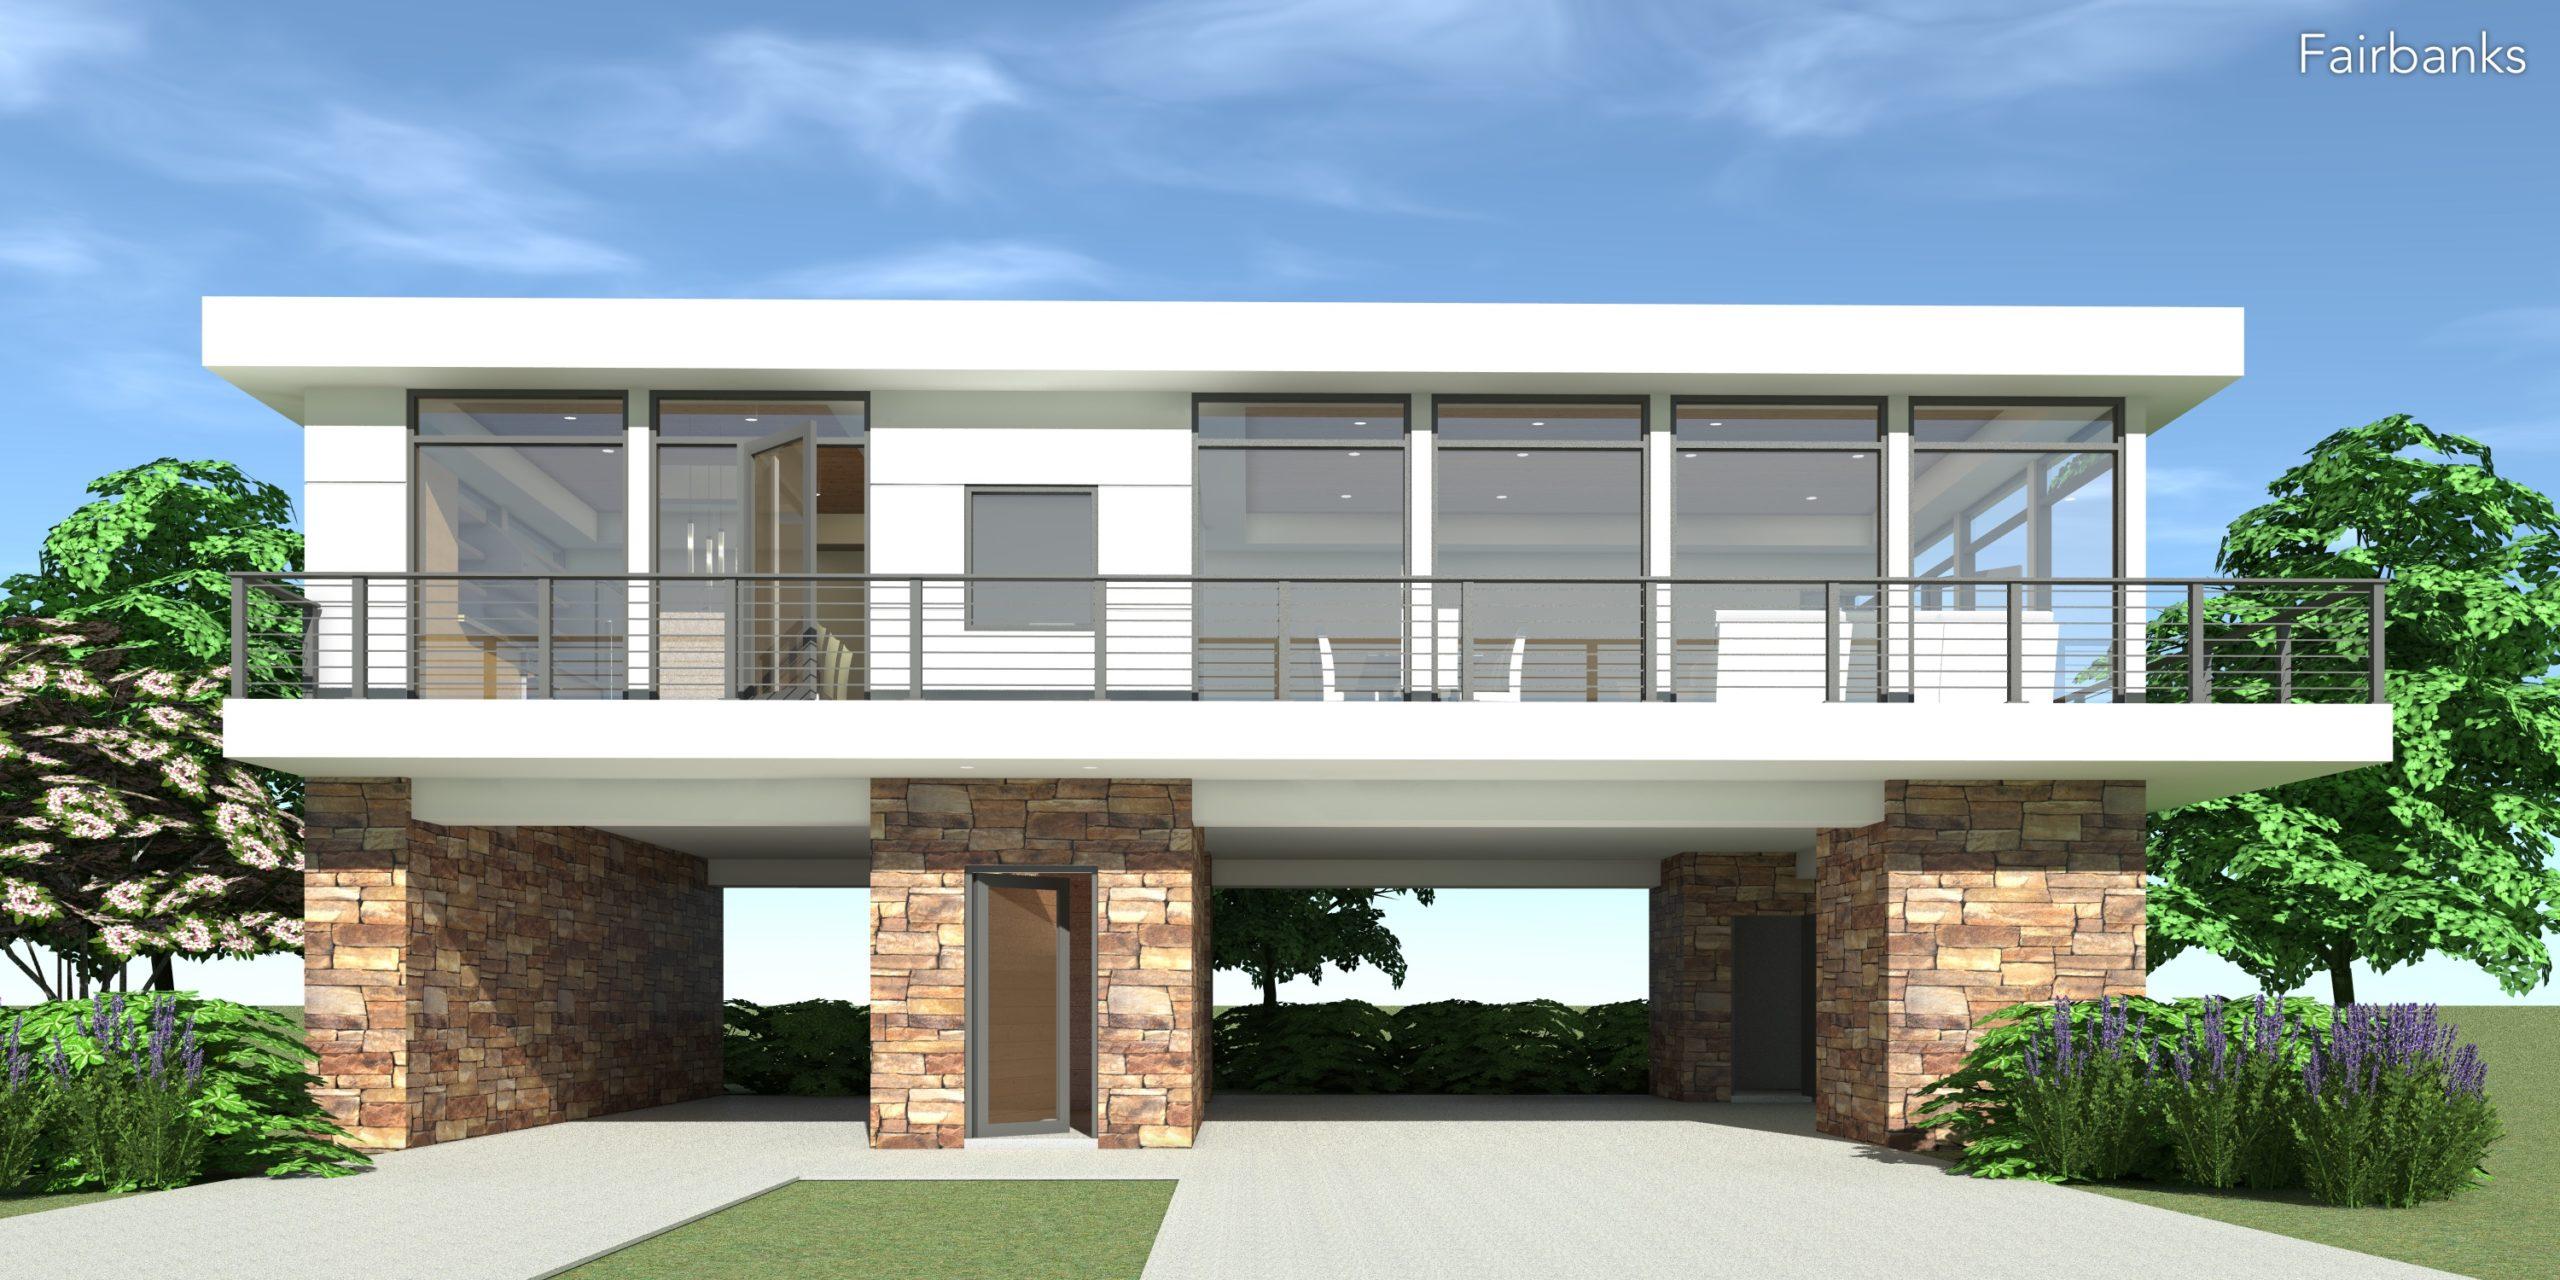 Fairbanks House Plan - Tyree House Plans